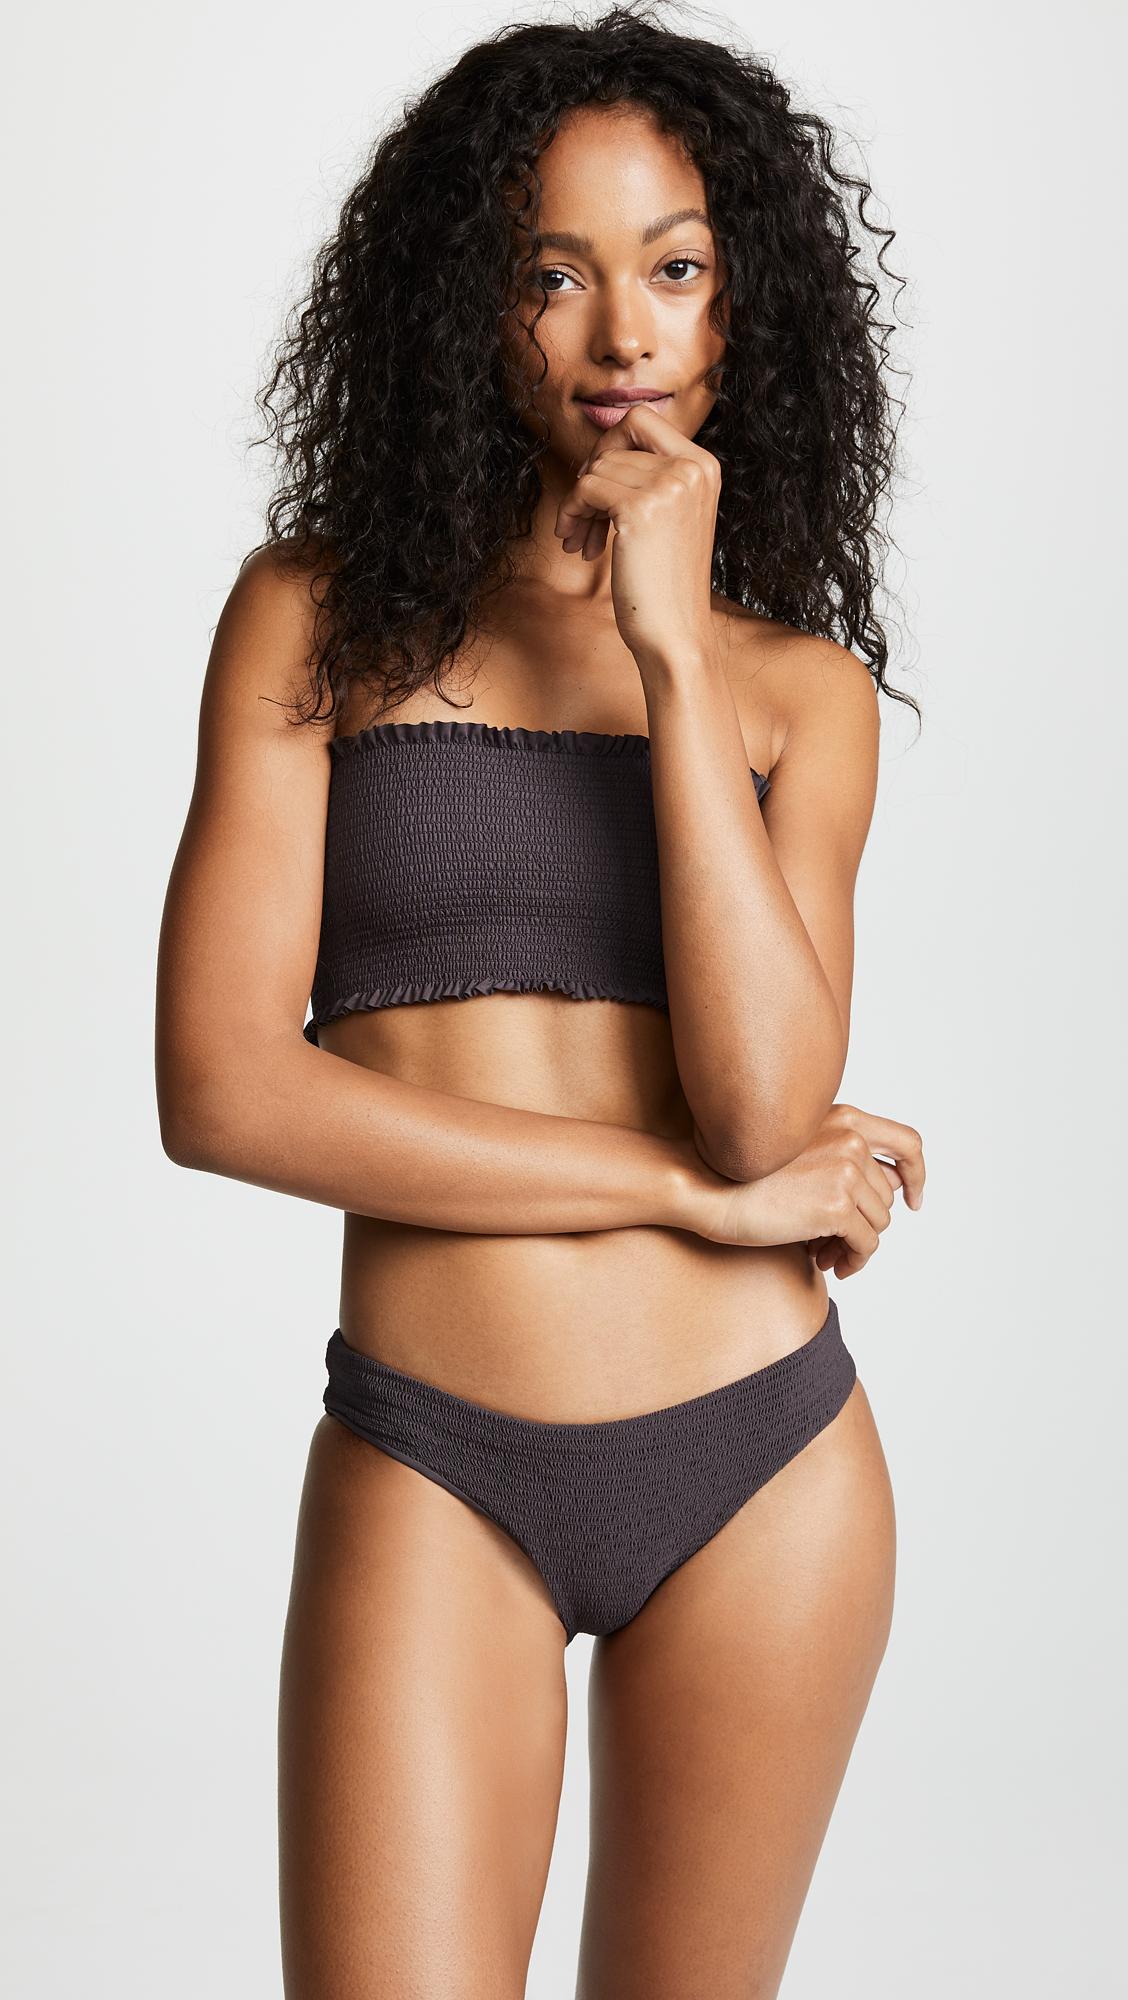 4f1542743c2 New Swimsuit Trends 2019 Cool Bikini, One-Piece Styles